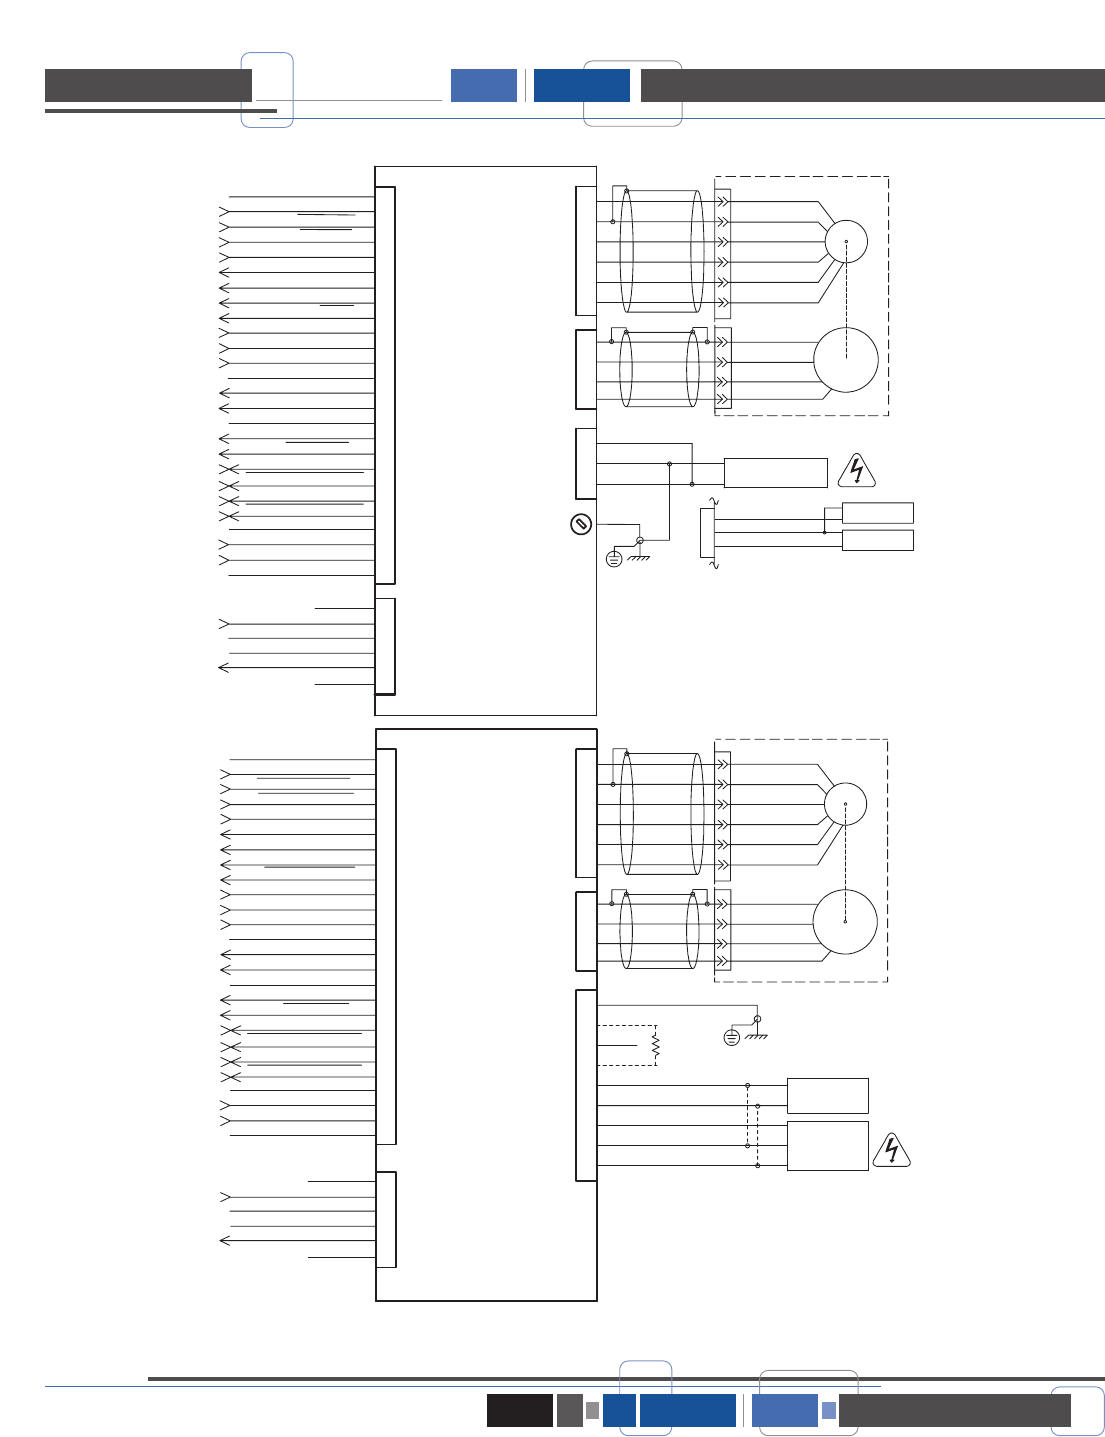 Kollmorgen Two Way Radio S200 Users Manual